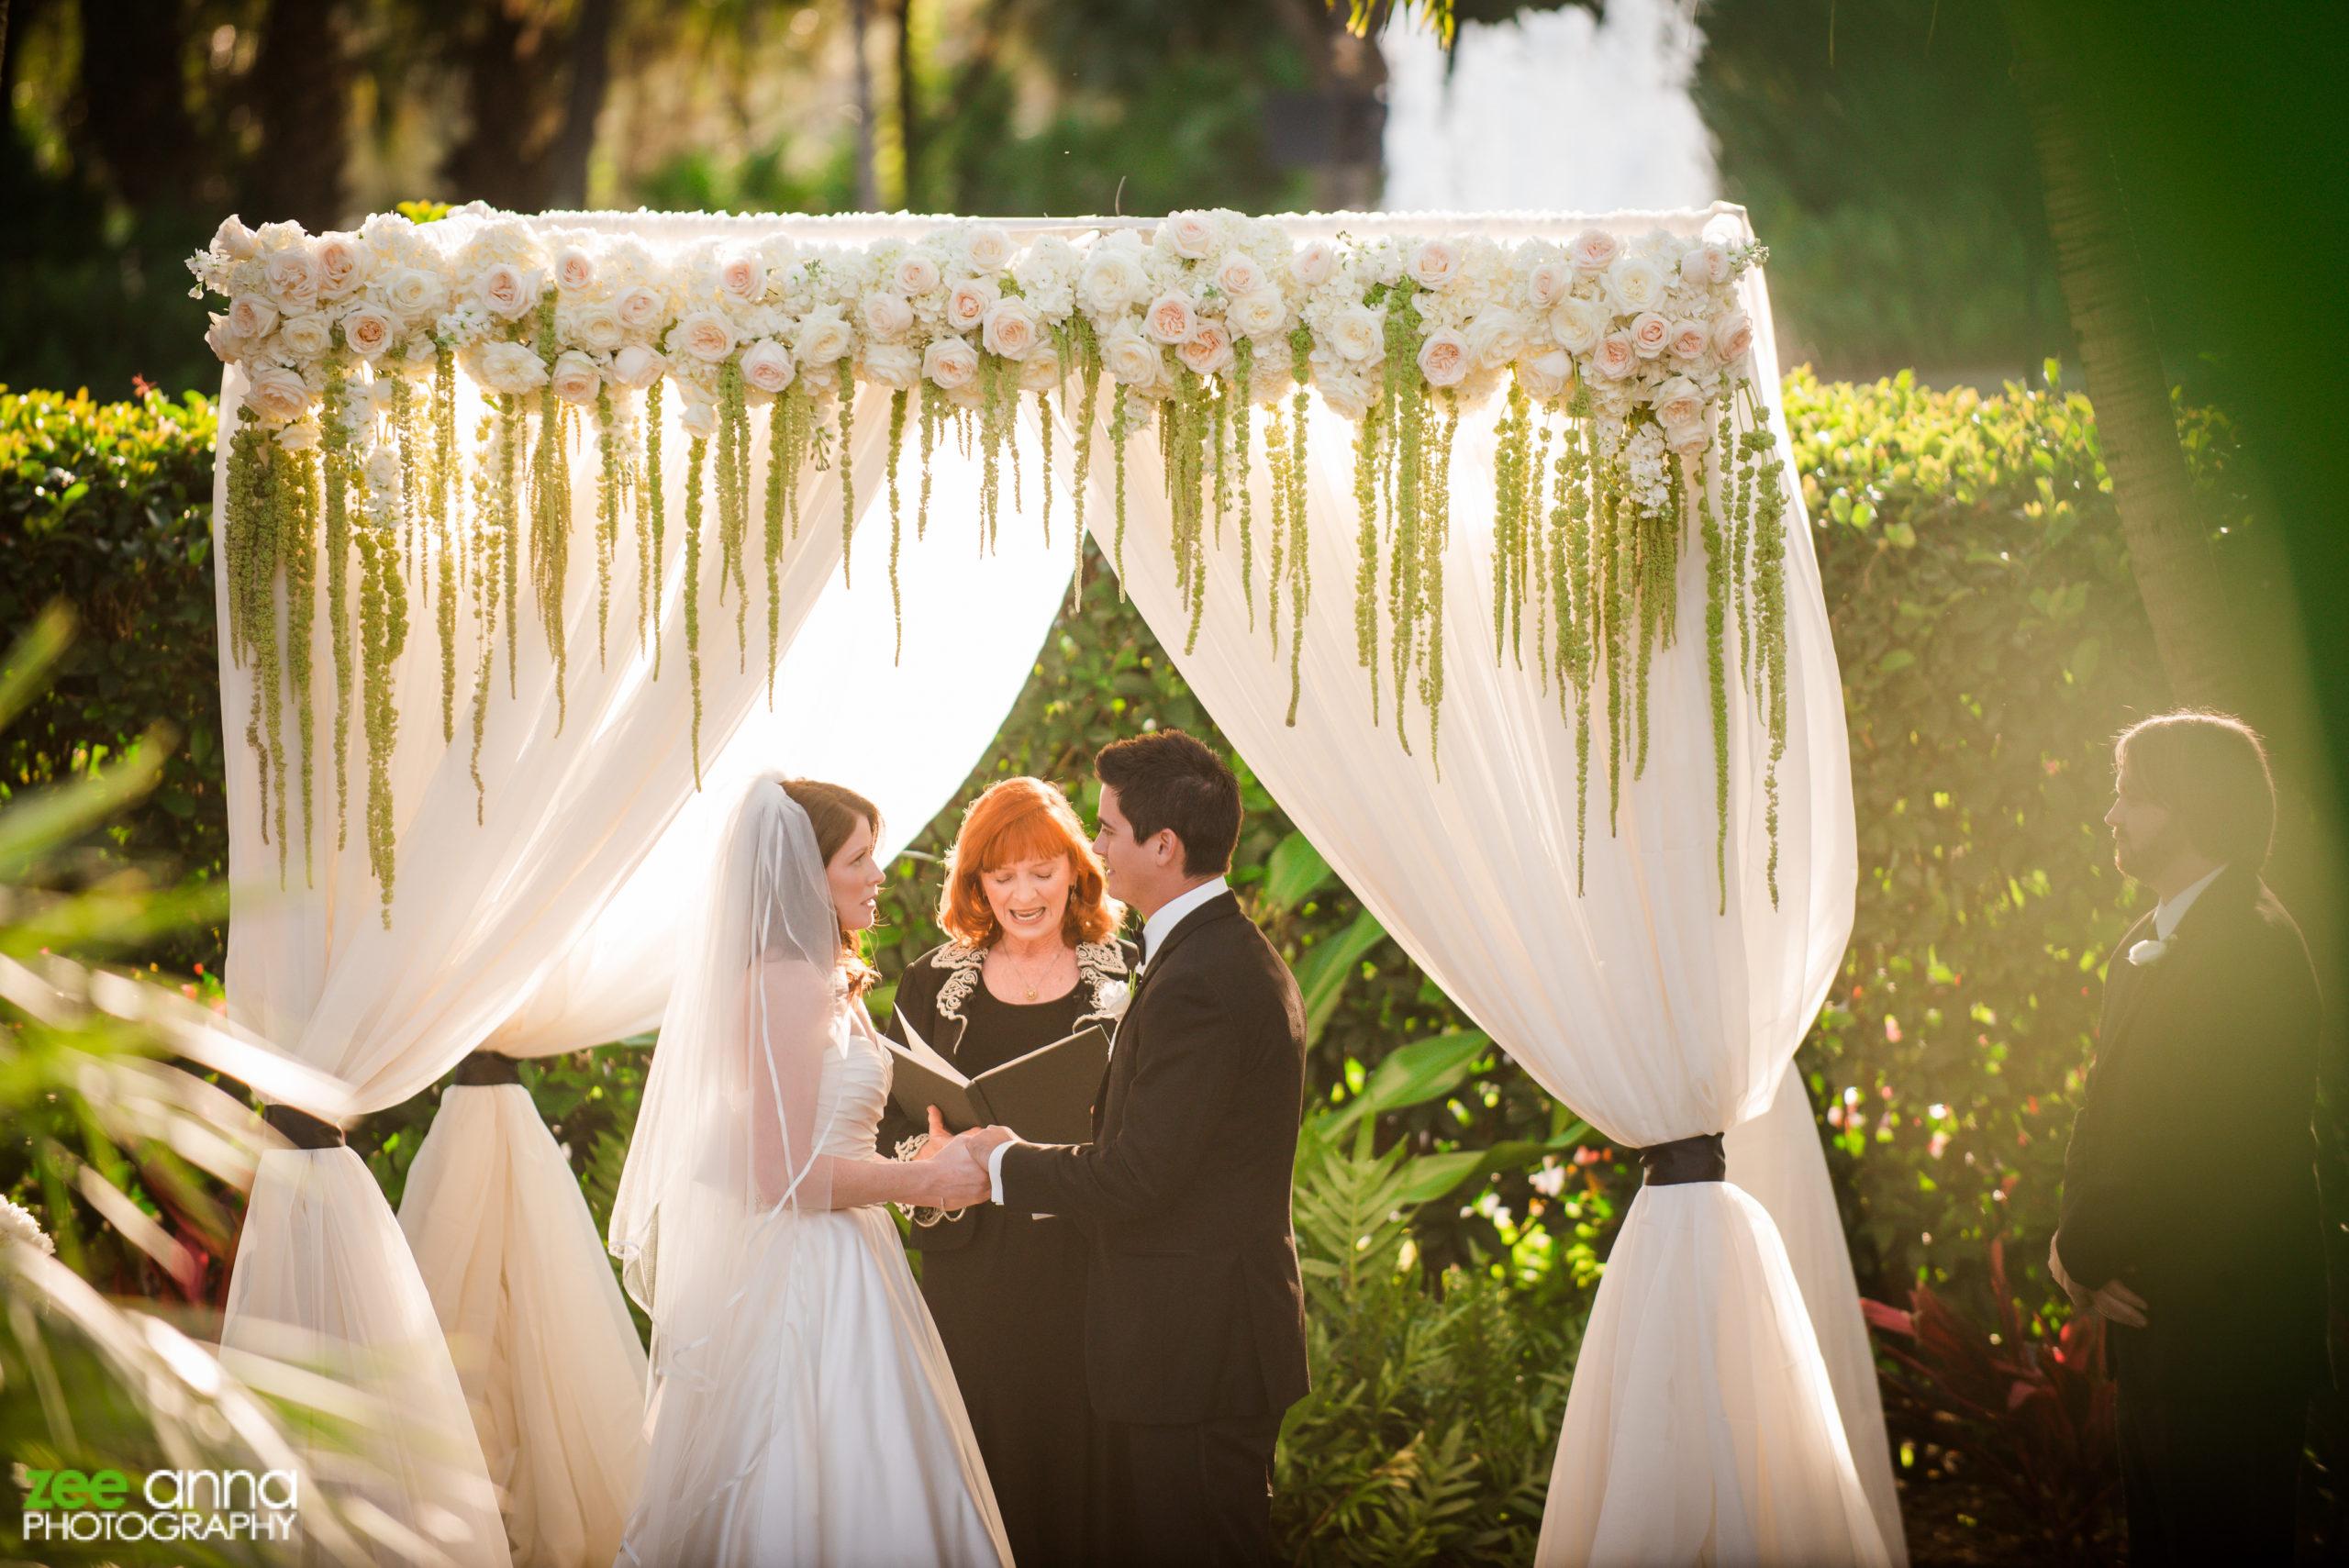 the club grandezza wedding zee anna photography